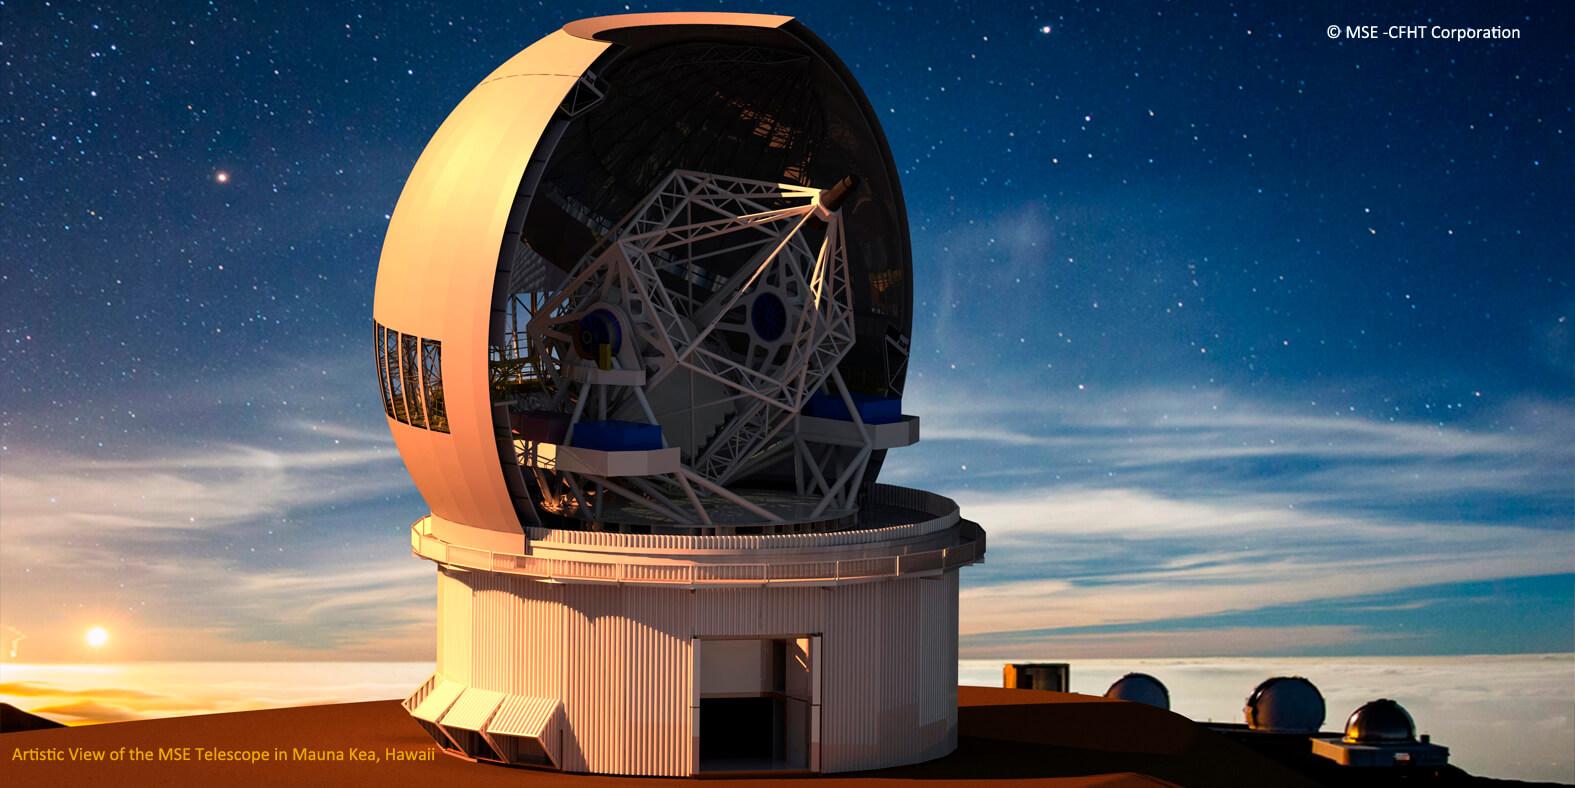 Maunakea_Spectroscopic_Explorer_MSE_Telescope_Hawaii_USA_IDOM_ADA__1_